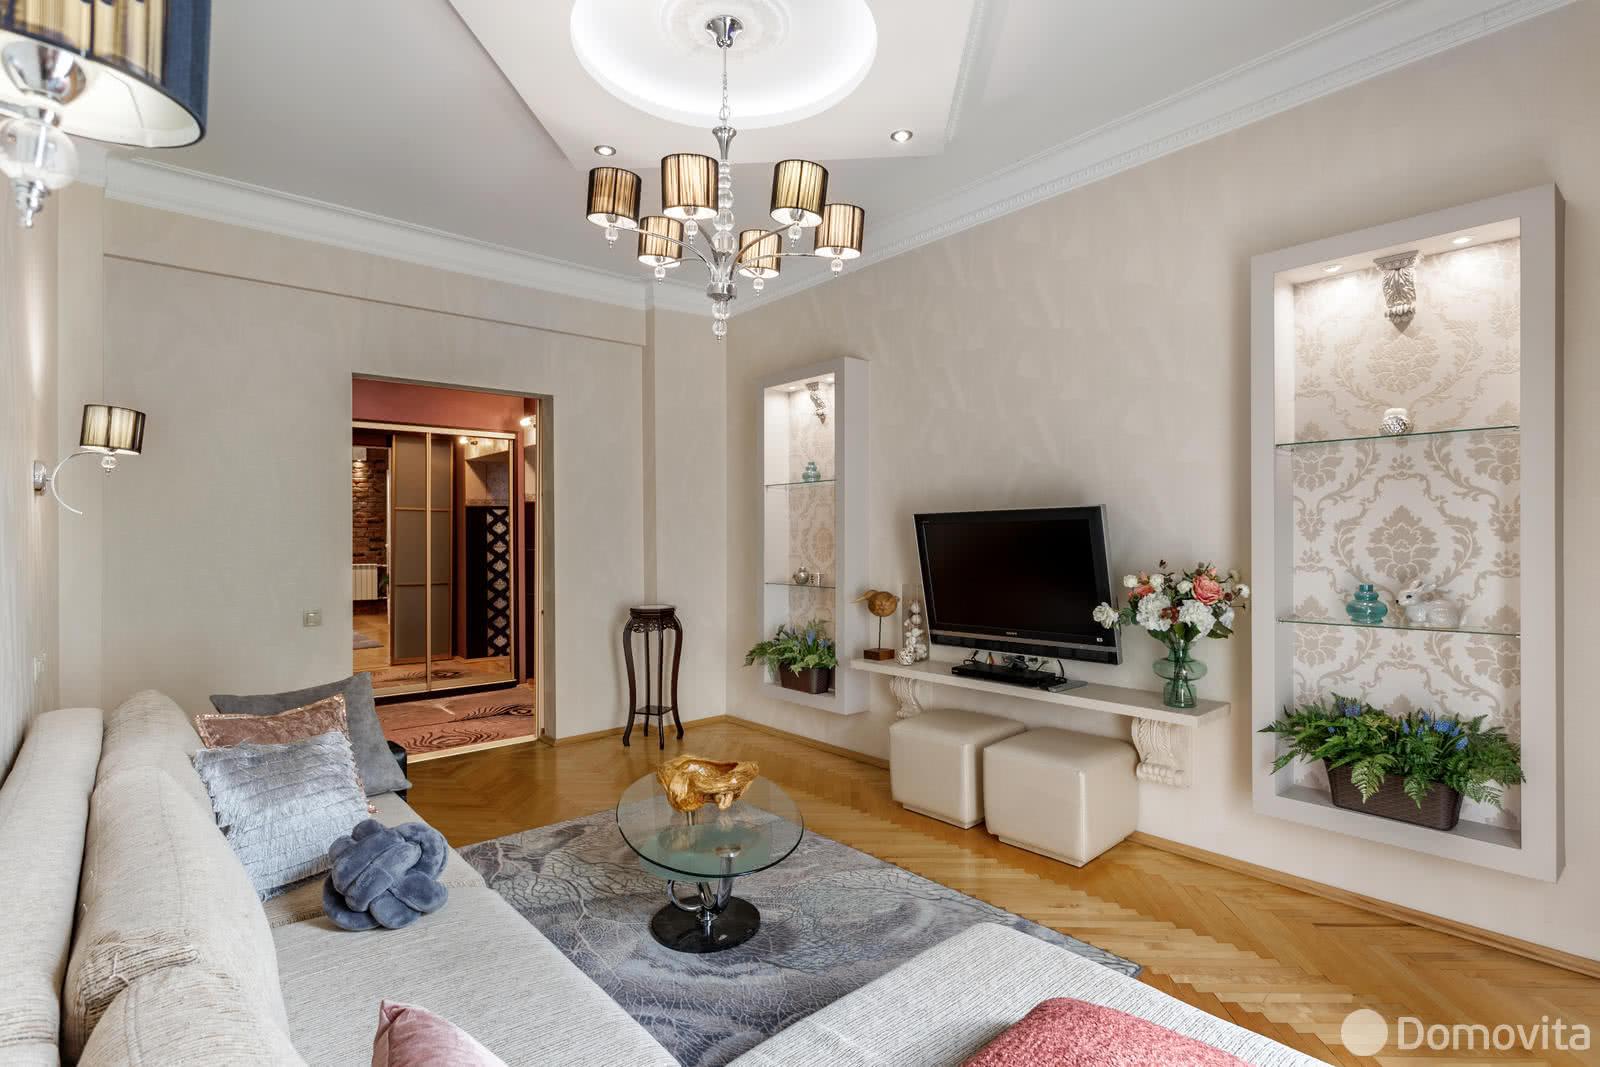 Аренда 2-комнатной квартиры на сутки в Минске ул. Красная, д. 18 - фото 2